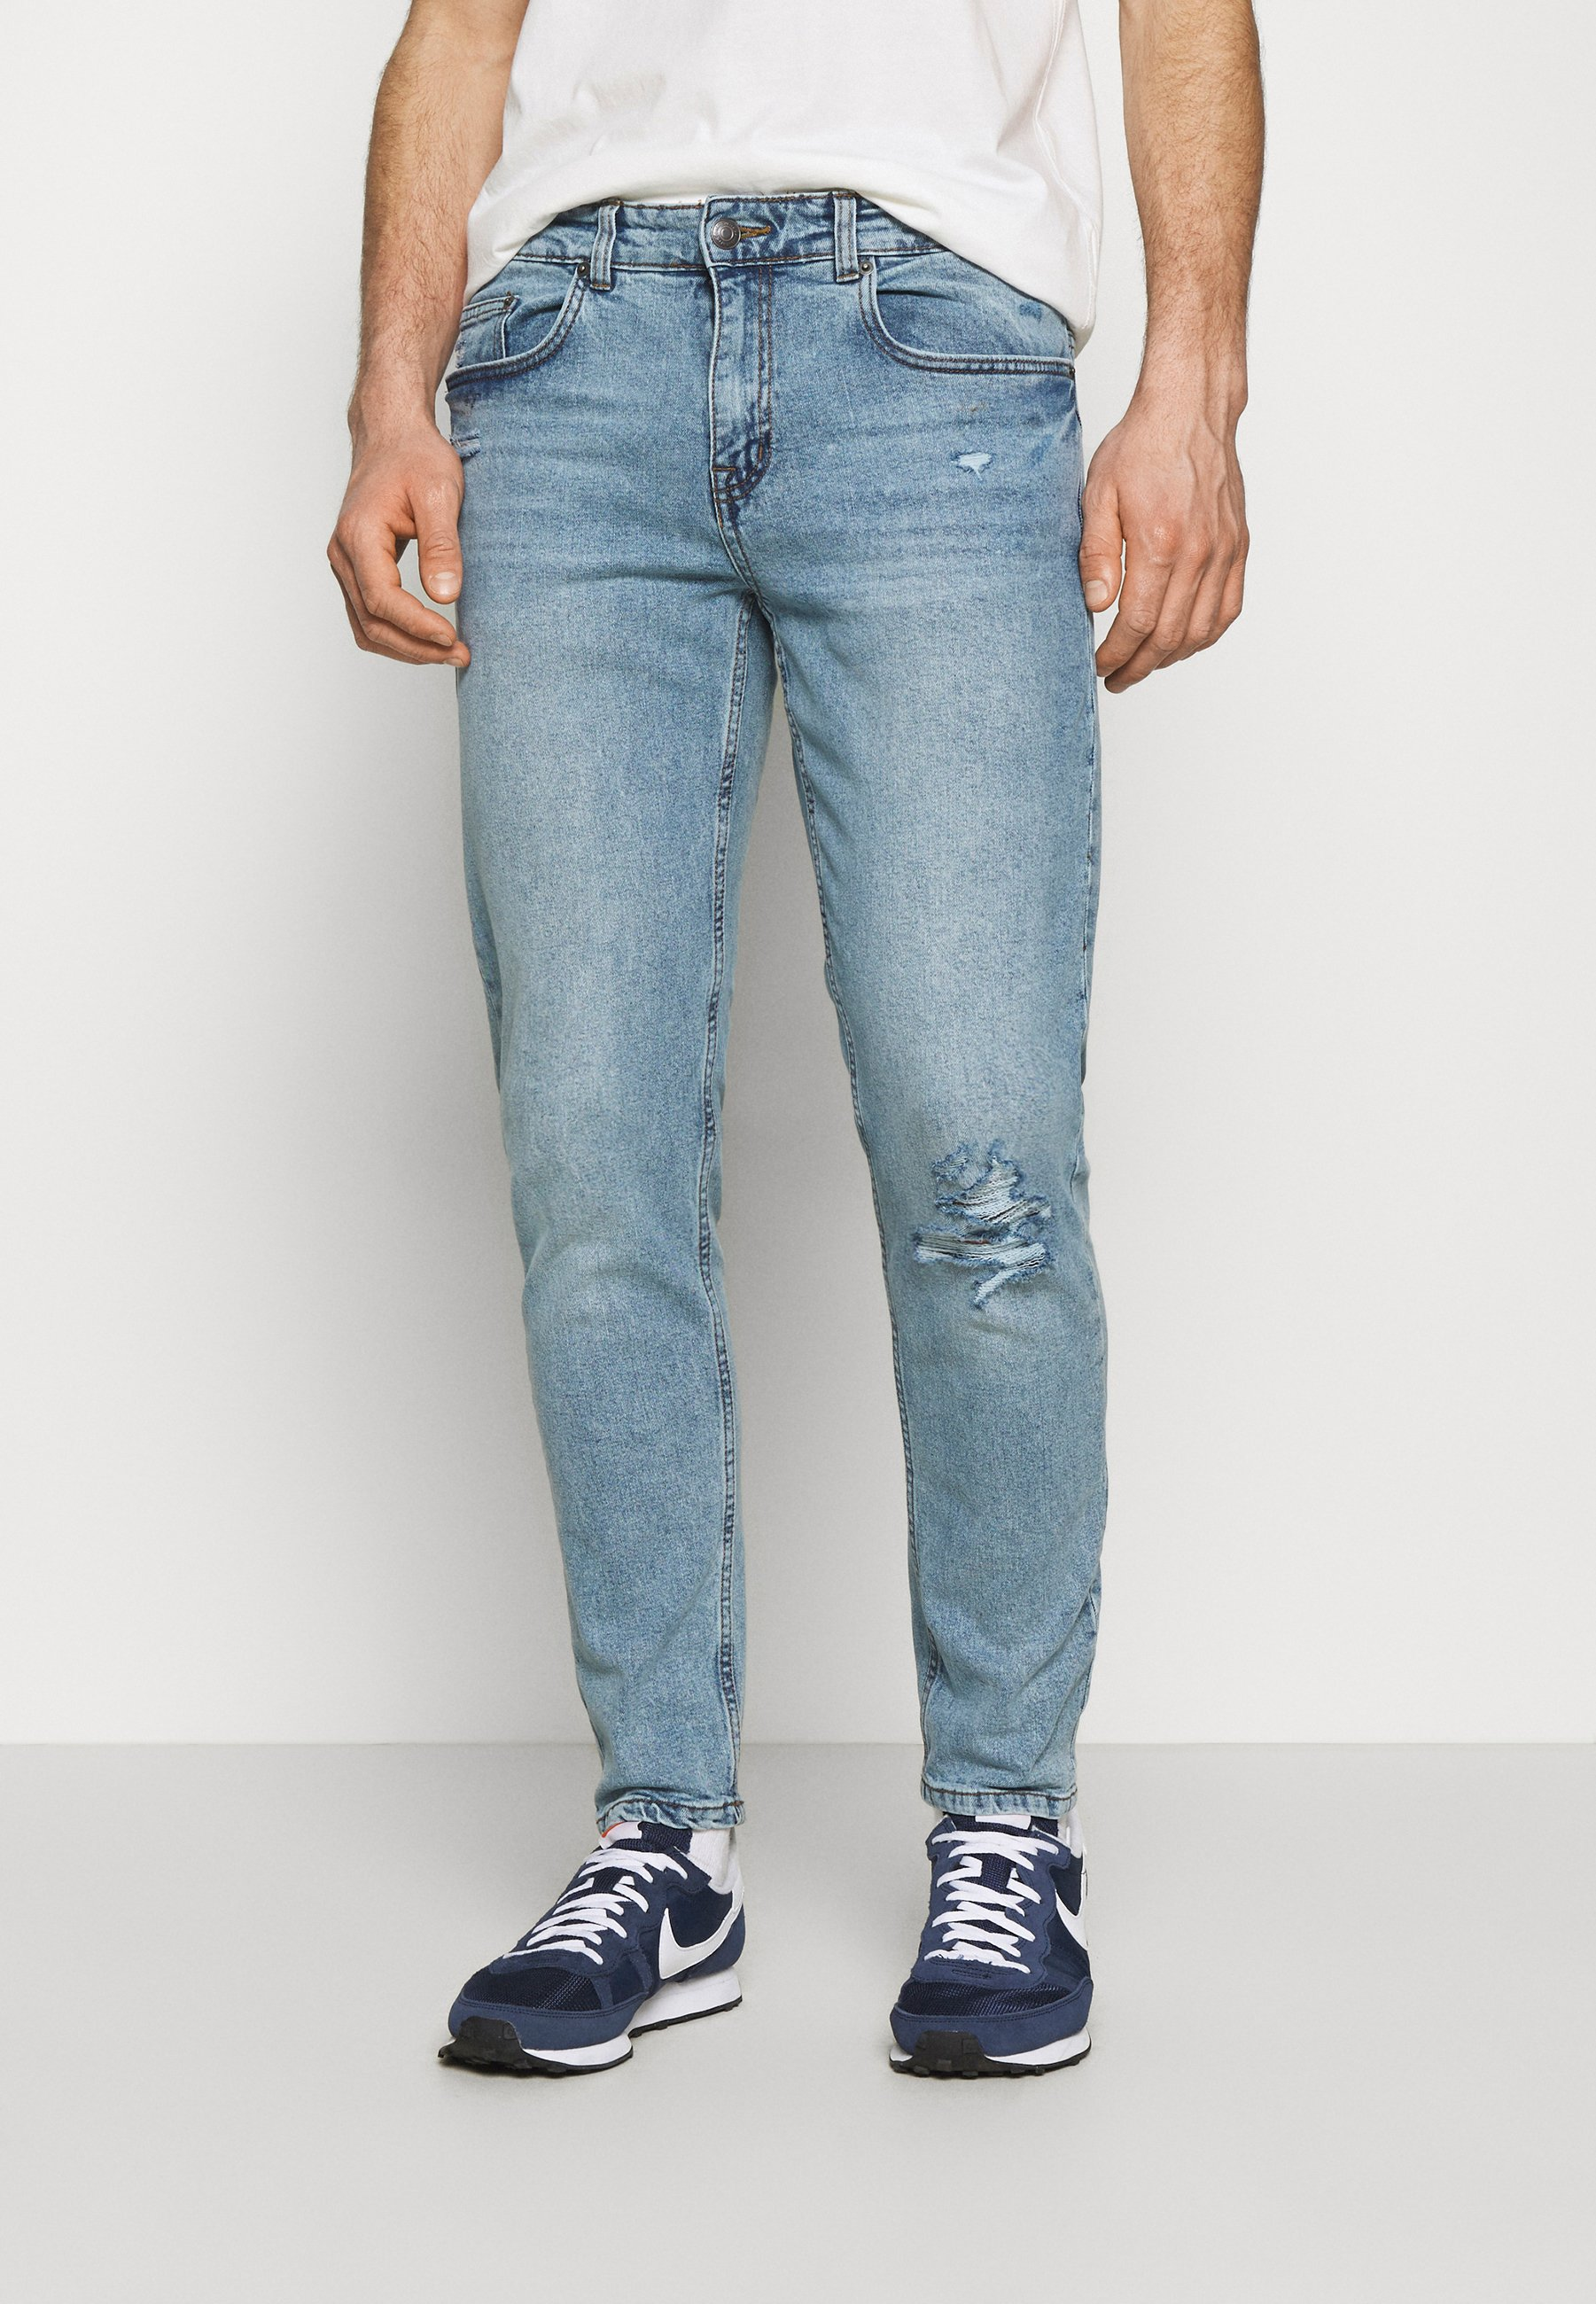 Men NEPARIS TINTED LIGHT BLUE JEANS UNISEX - Jeans Tapered Fit